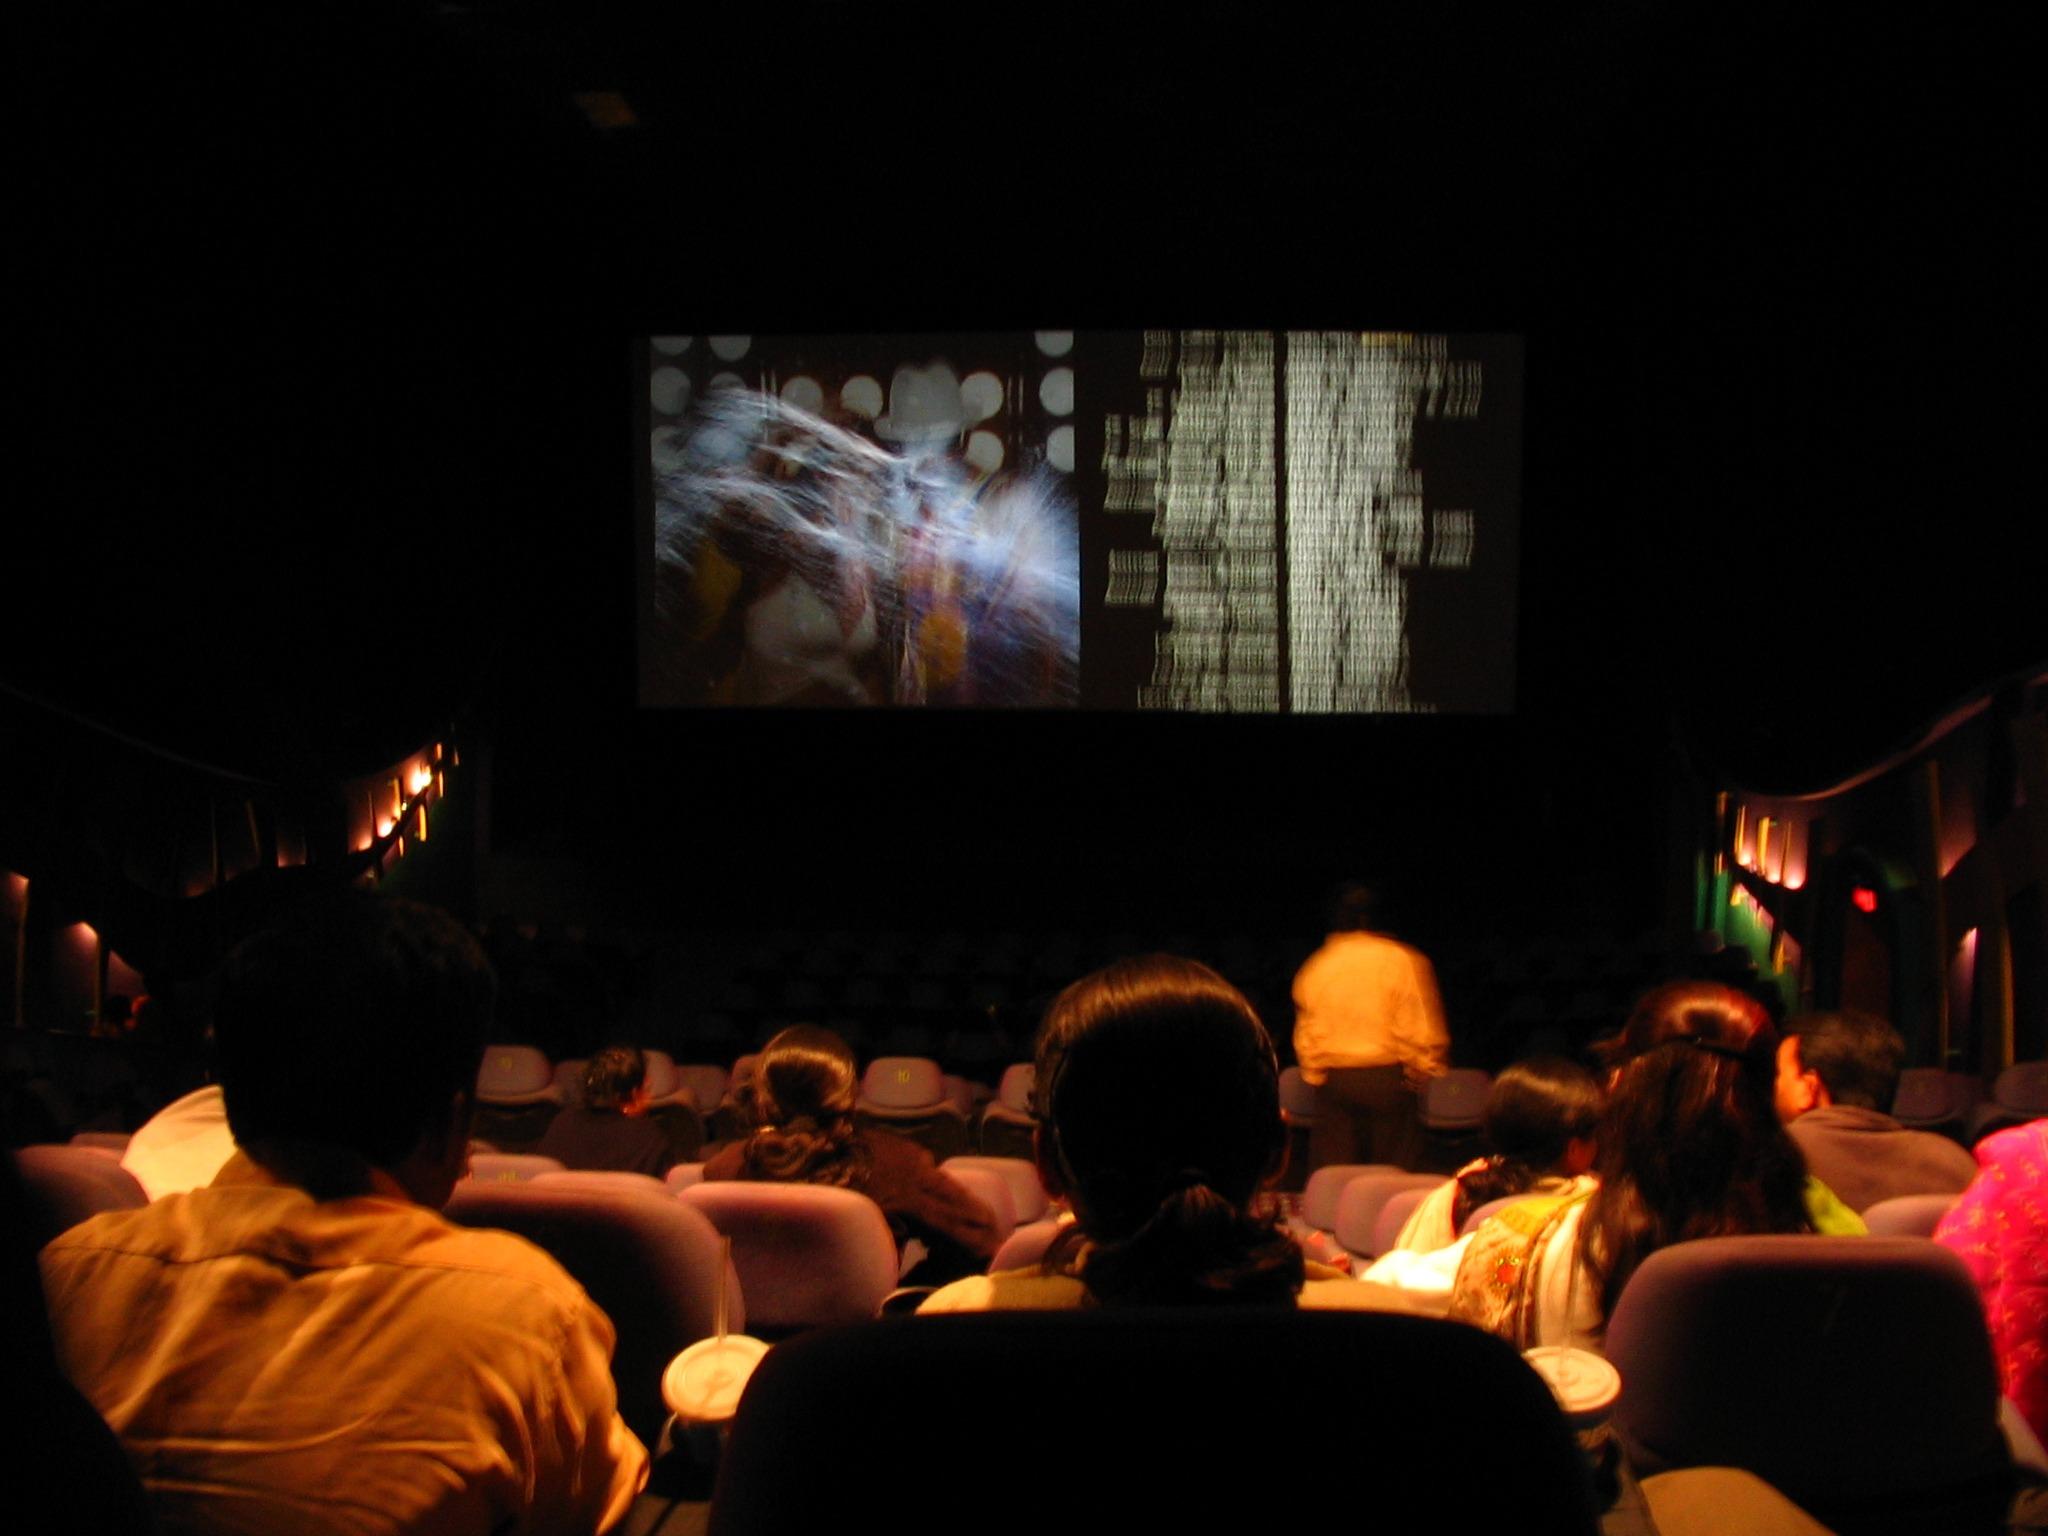 Movie Theater Audience